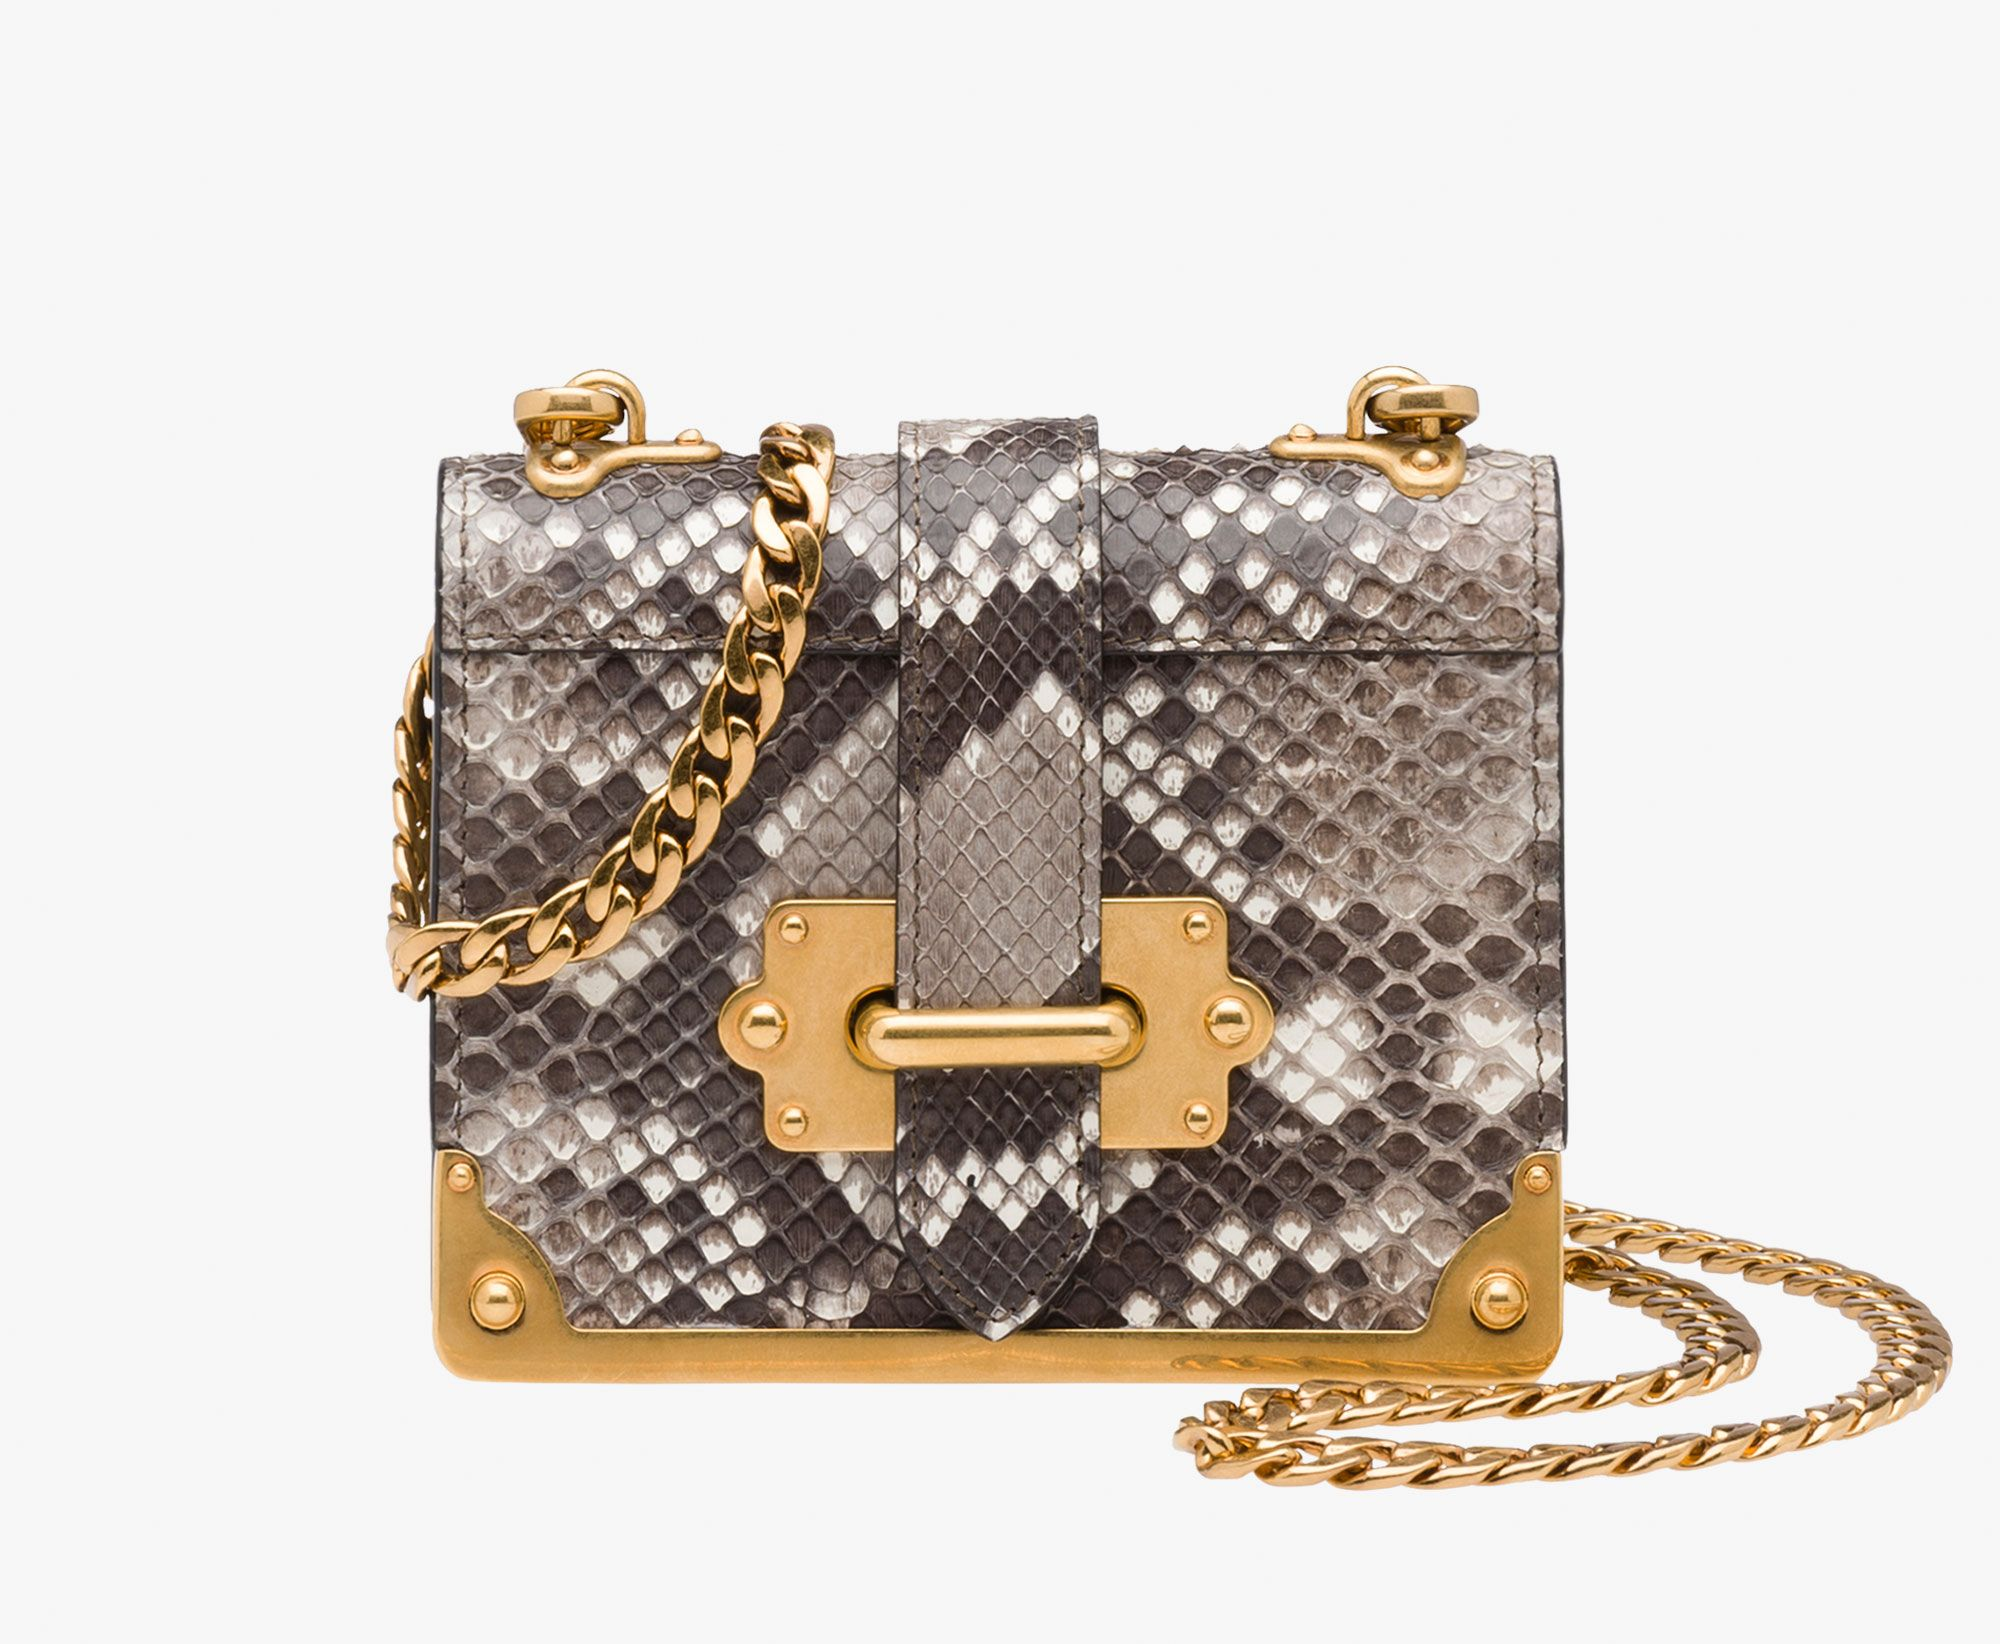 fba75d33b8ba Prada Micro Cahier python leather bag Detachable metal chain shoulder strap  Detachable leather strap Bronze-finish metal hardware Bronze metal  lettering ...